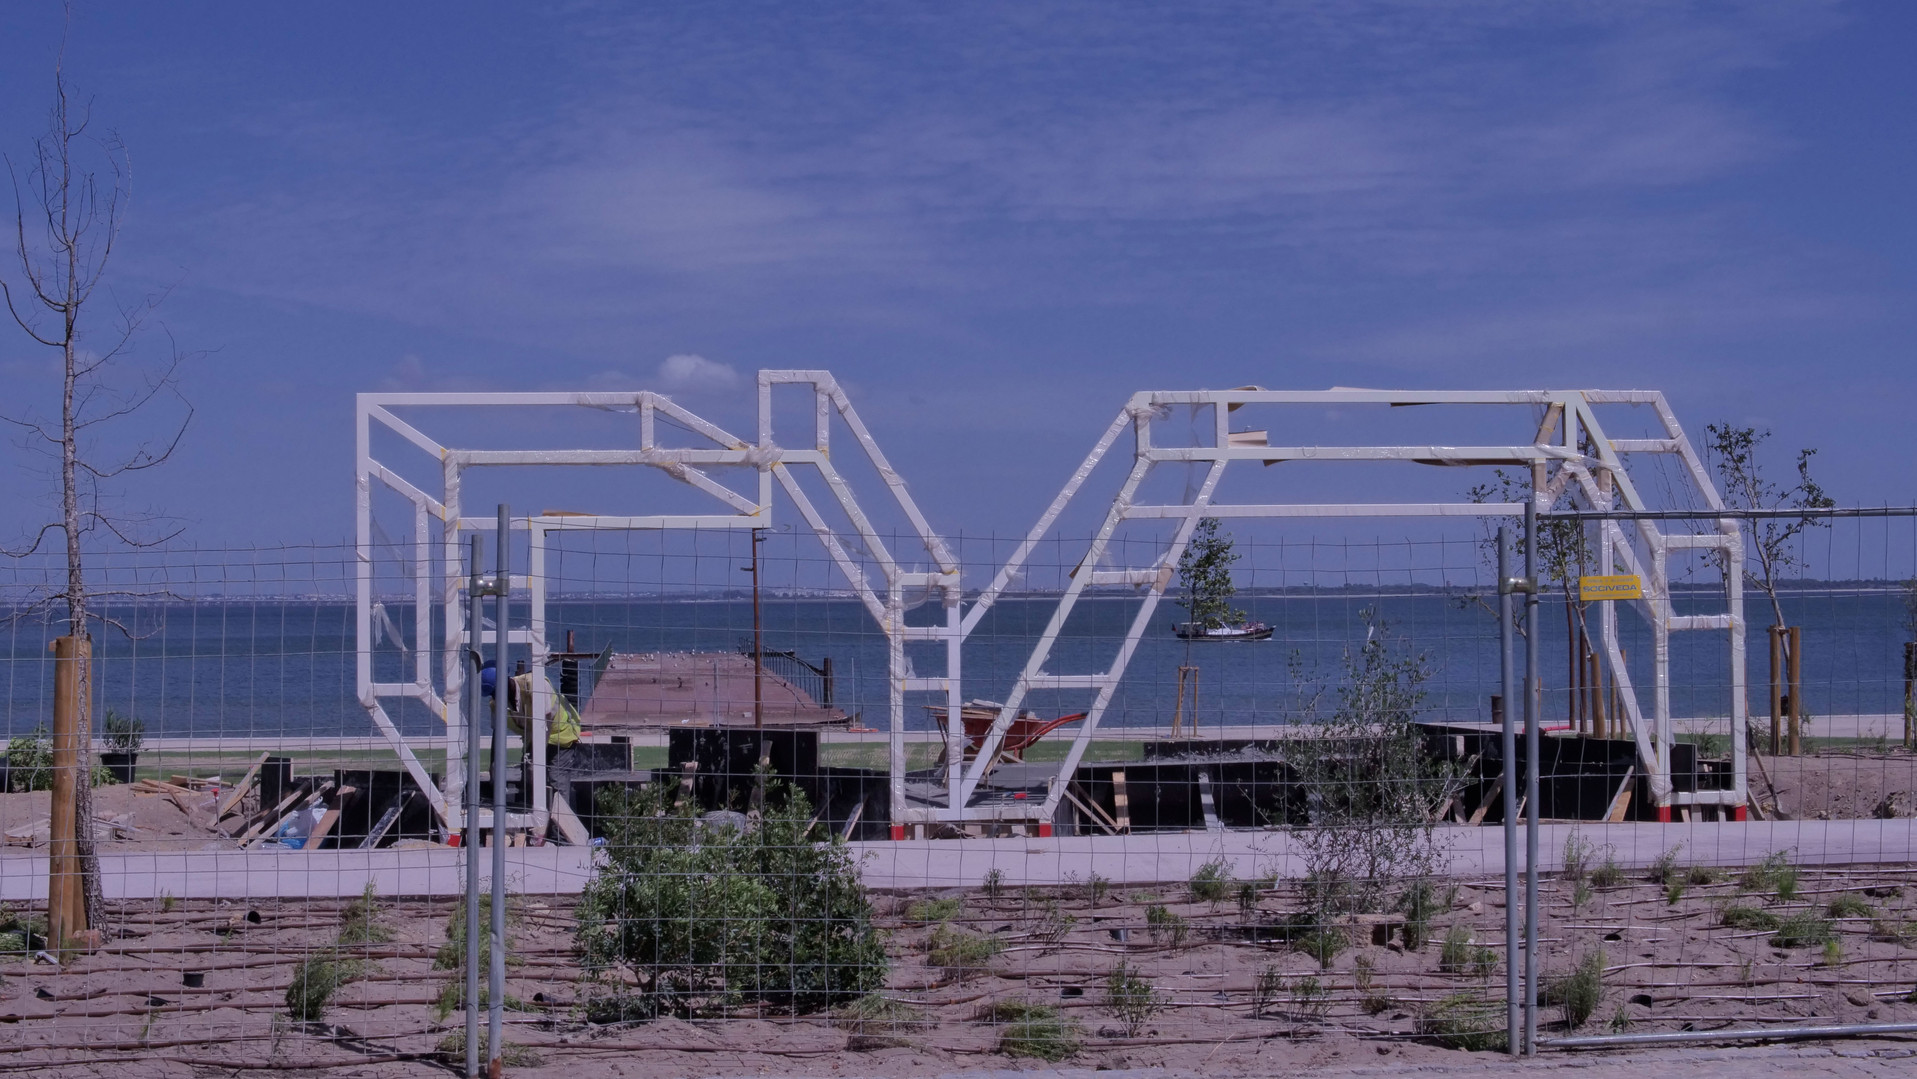 escultura-solar-3b.jpg